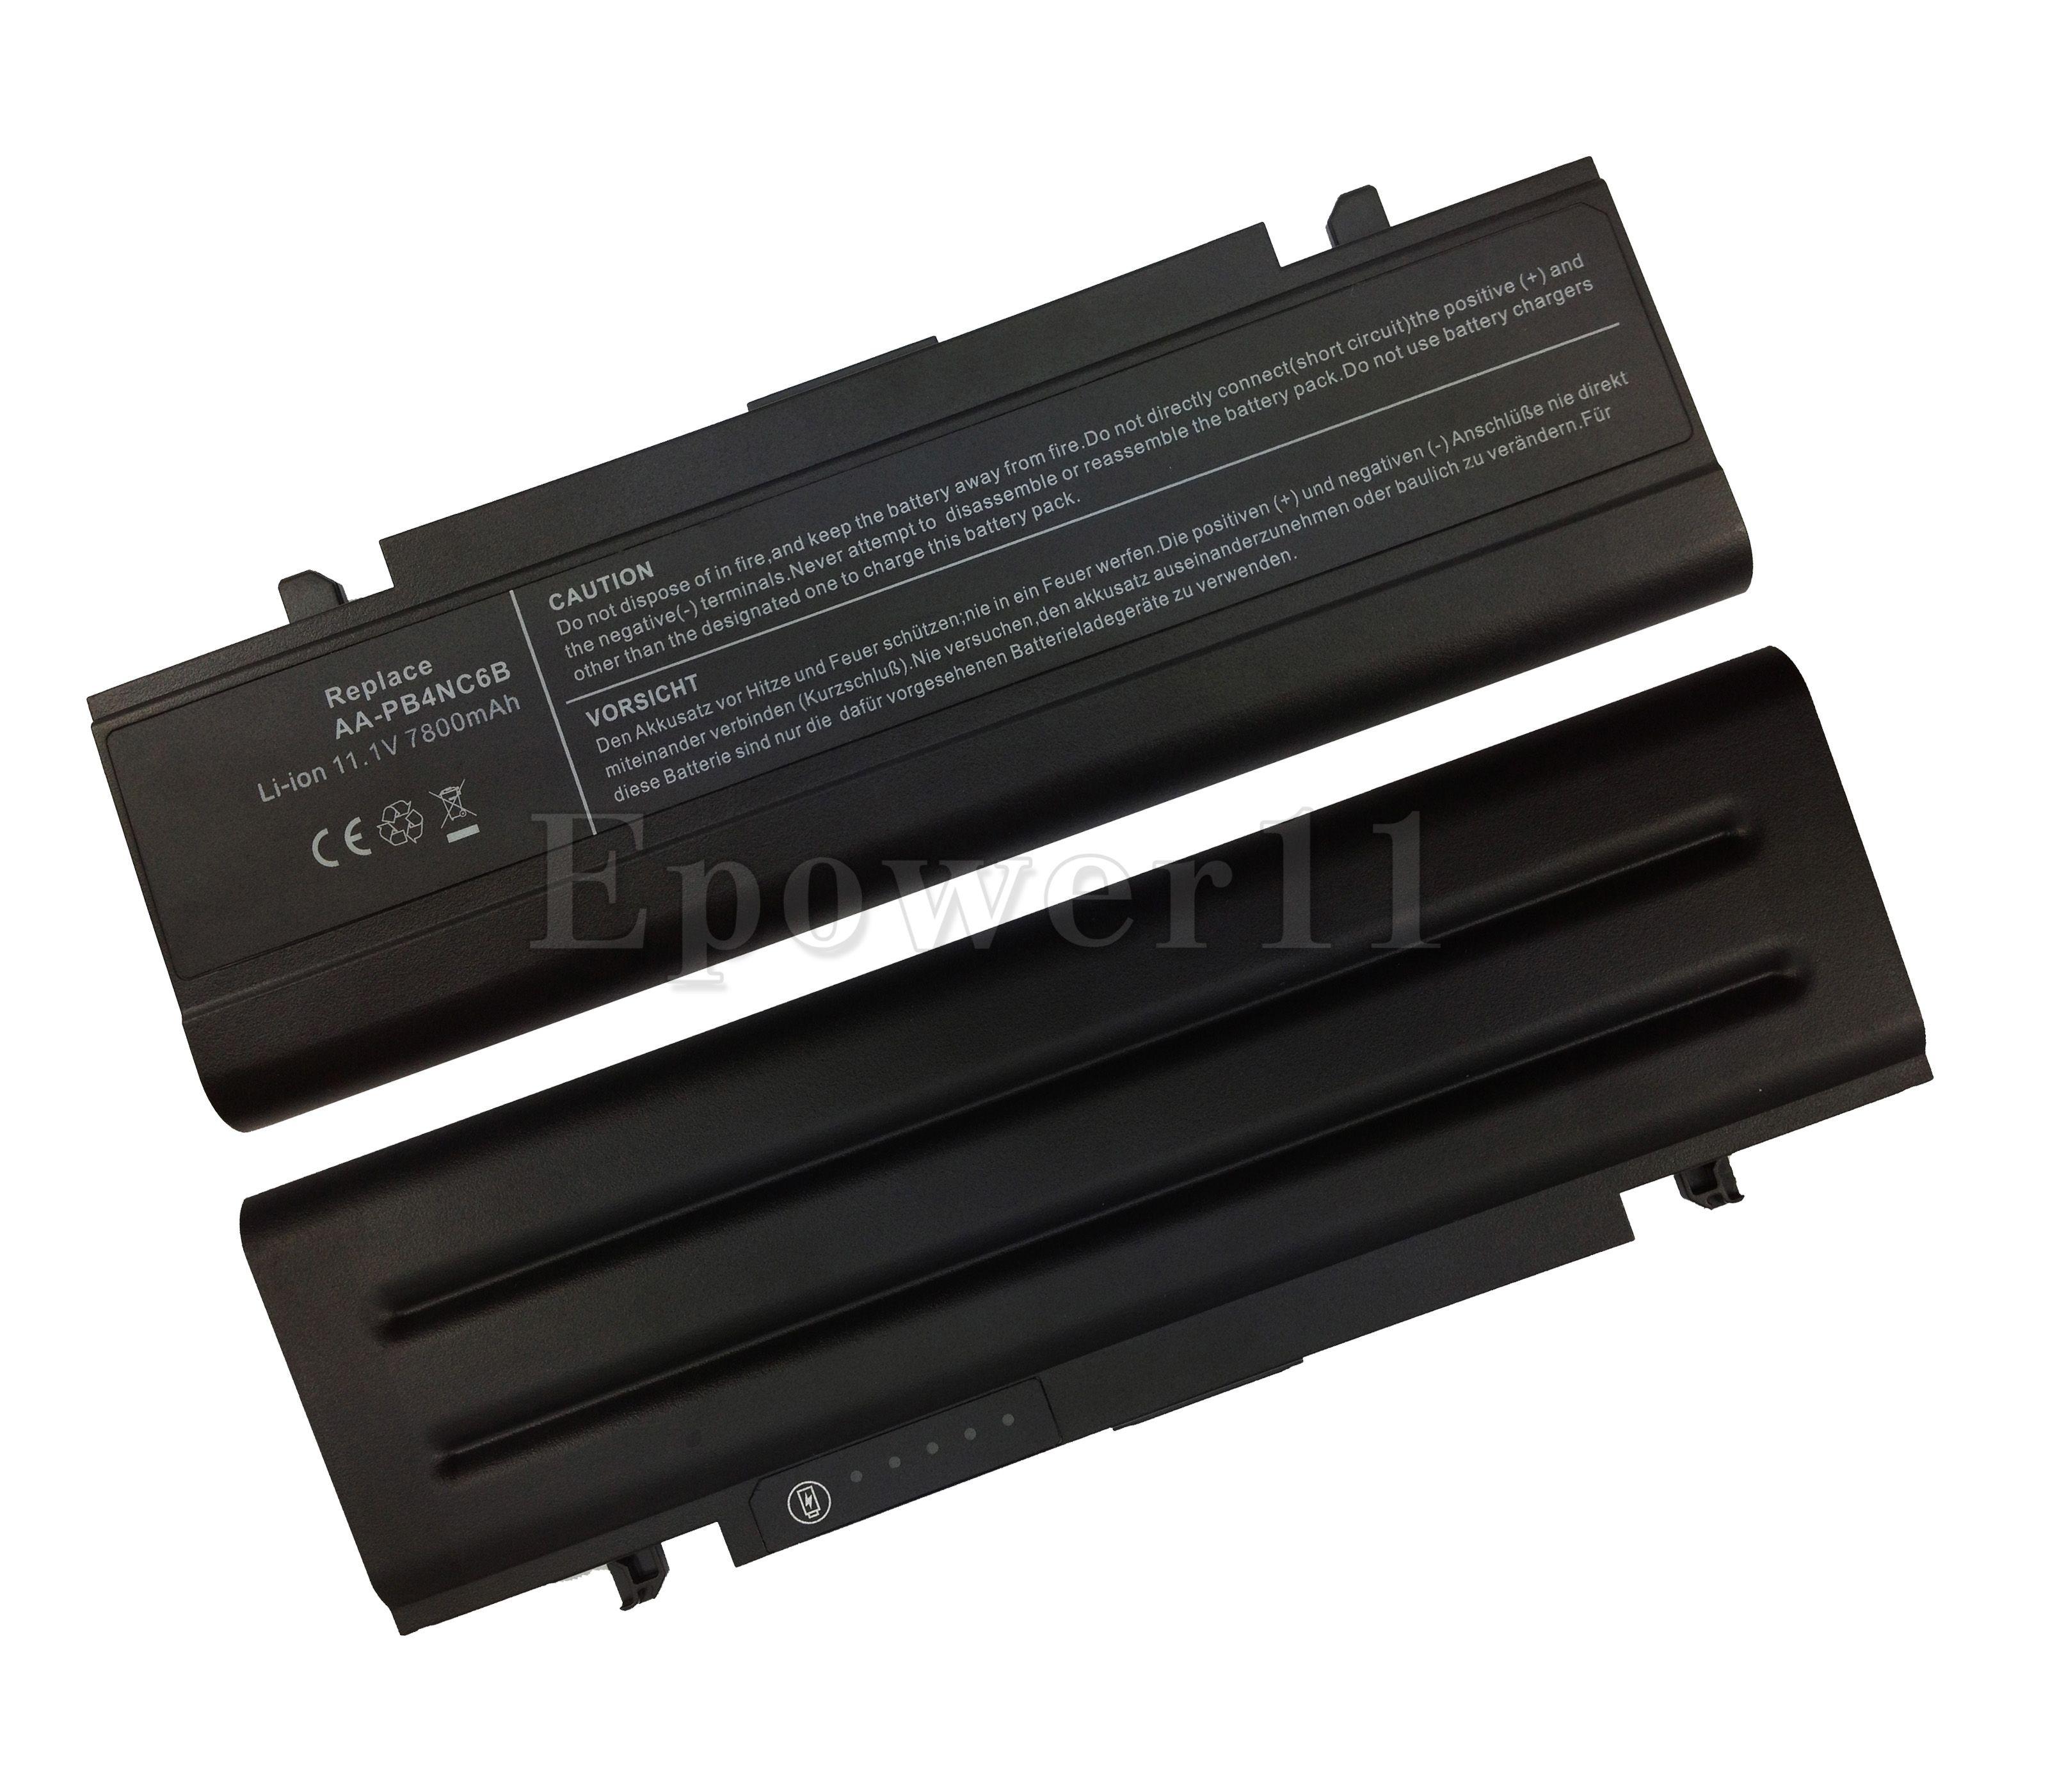 9cell Battery For Samsung Aa Pb2nc3b Pb2nc6b E Baterai Asus X200ca X200m X200ma F200ca A31n1302 Pb4nc6b Pb6nc6b Pl2nc9b Pb2nx6b